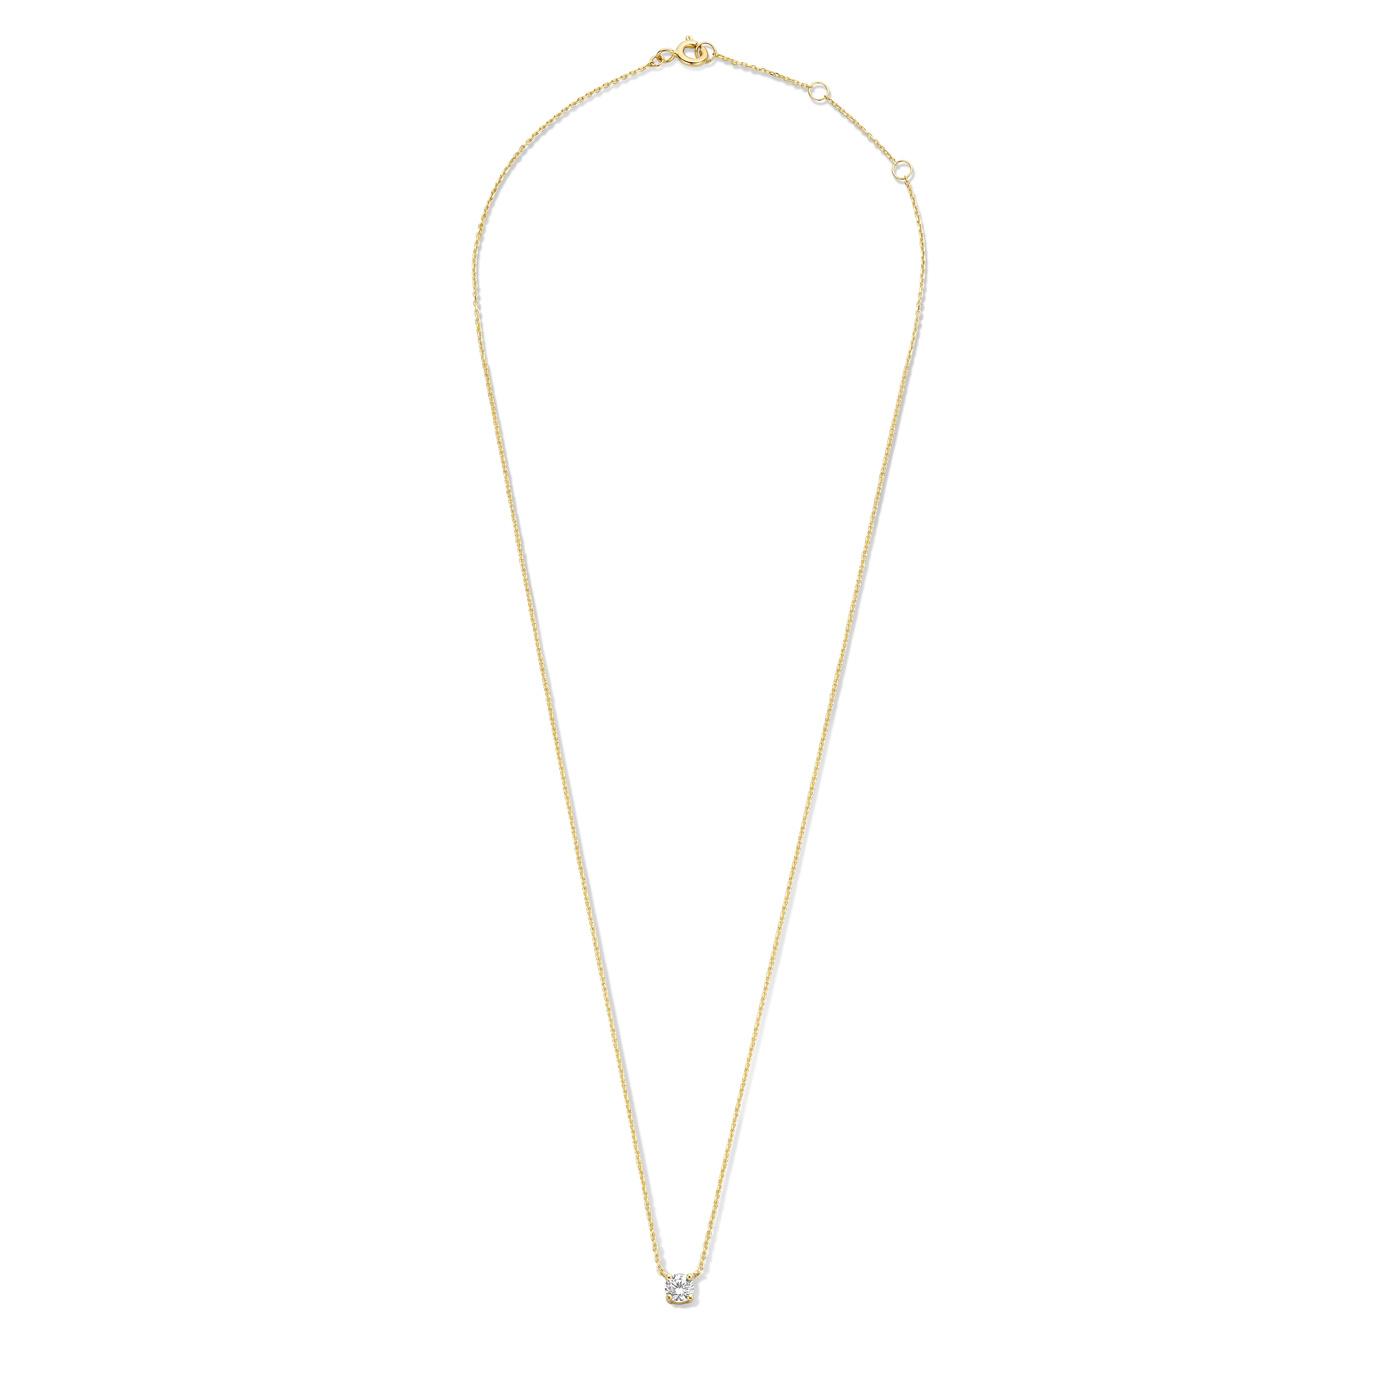 Isabel Bernard Le Marais Garance 14 karaat gouden collier met zirkonia